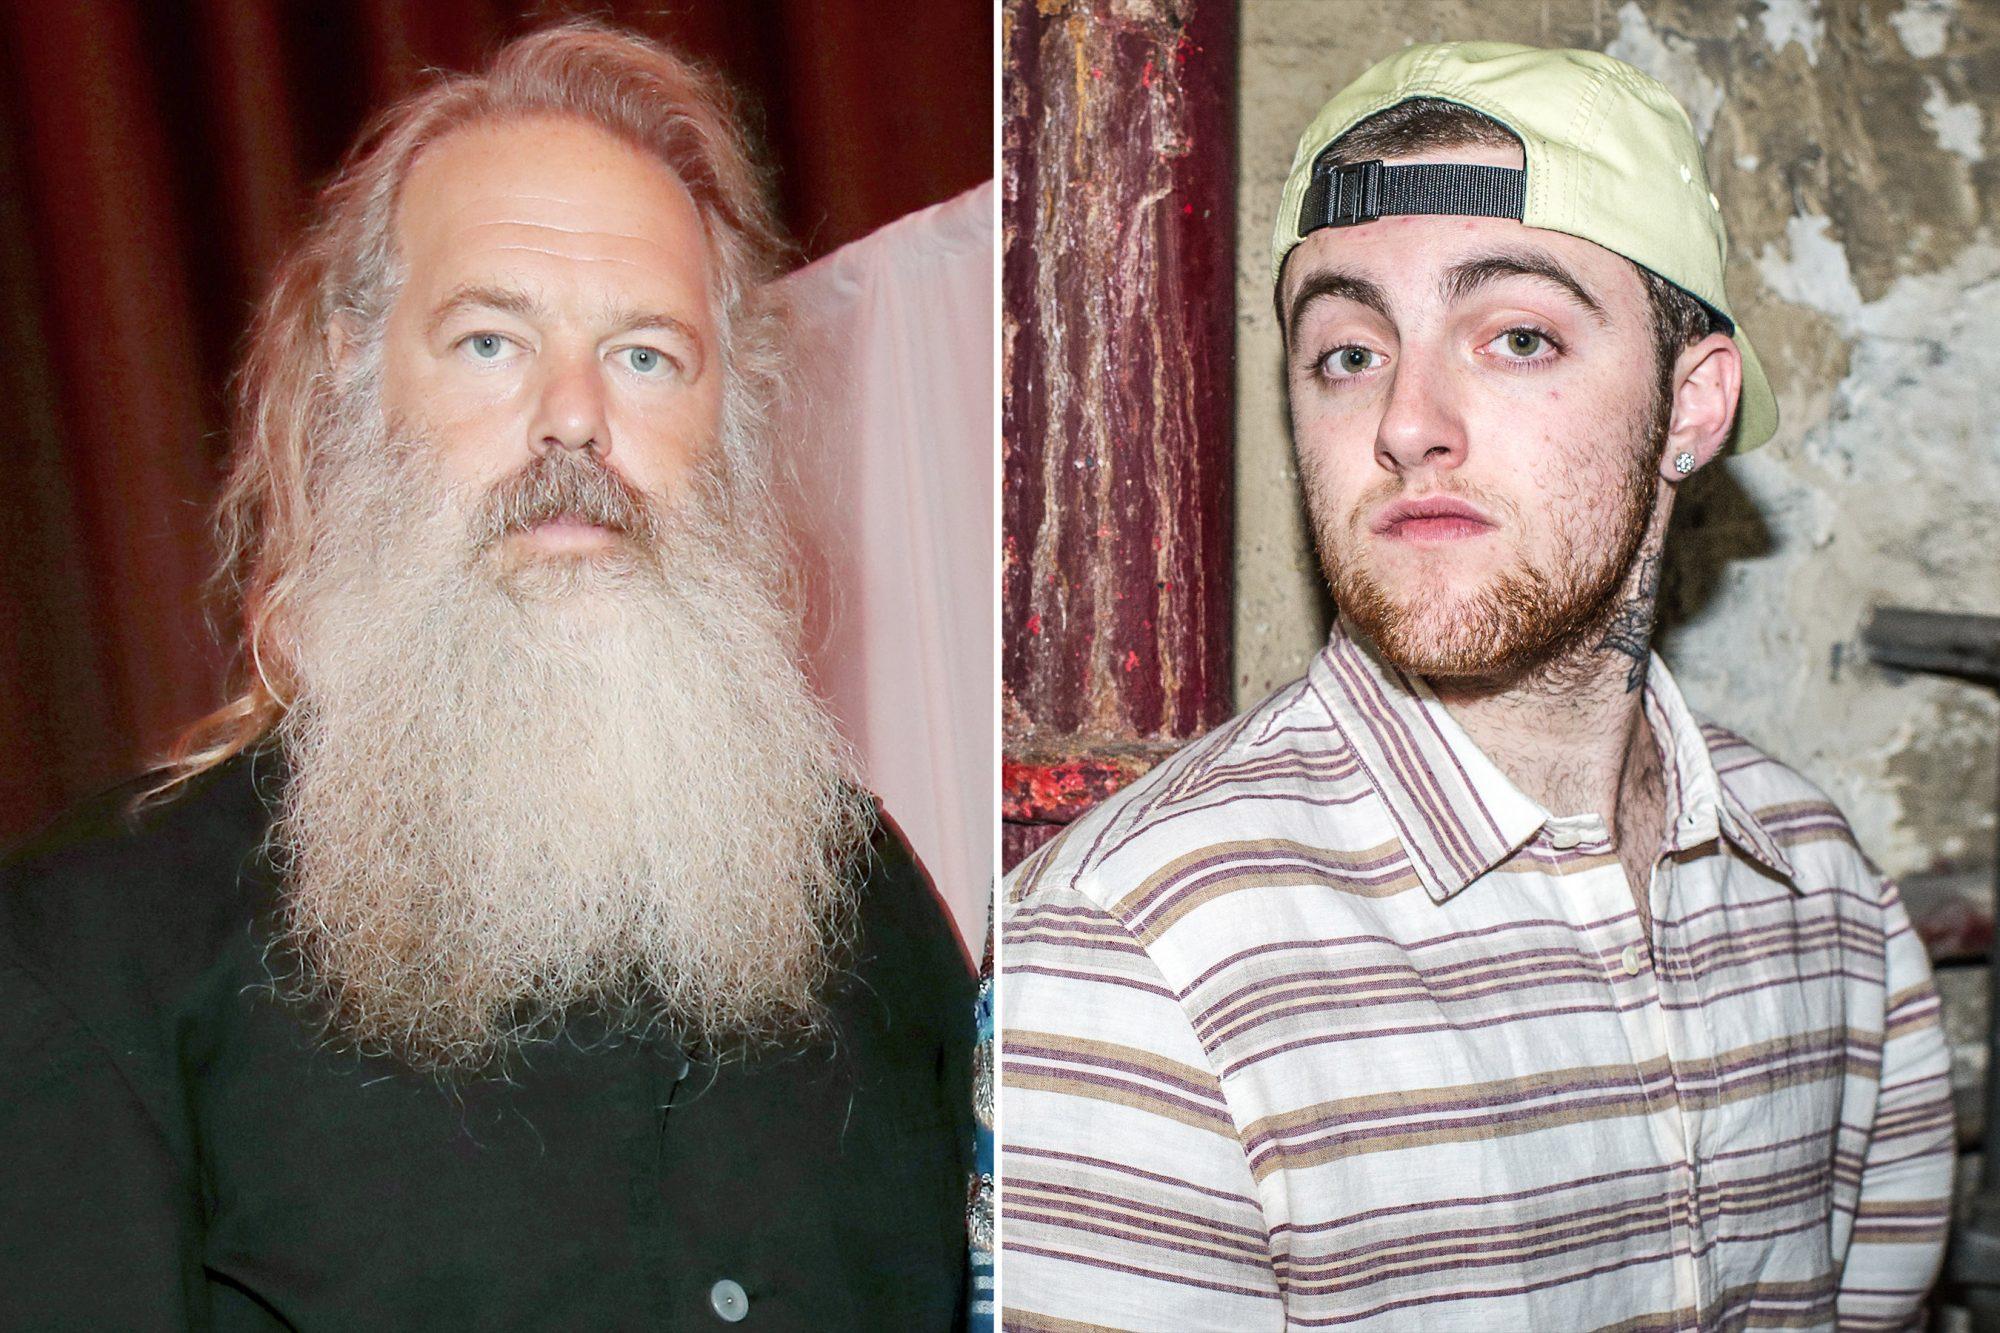 Mac Miller and Rick Rubin